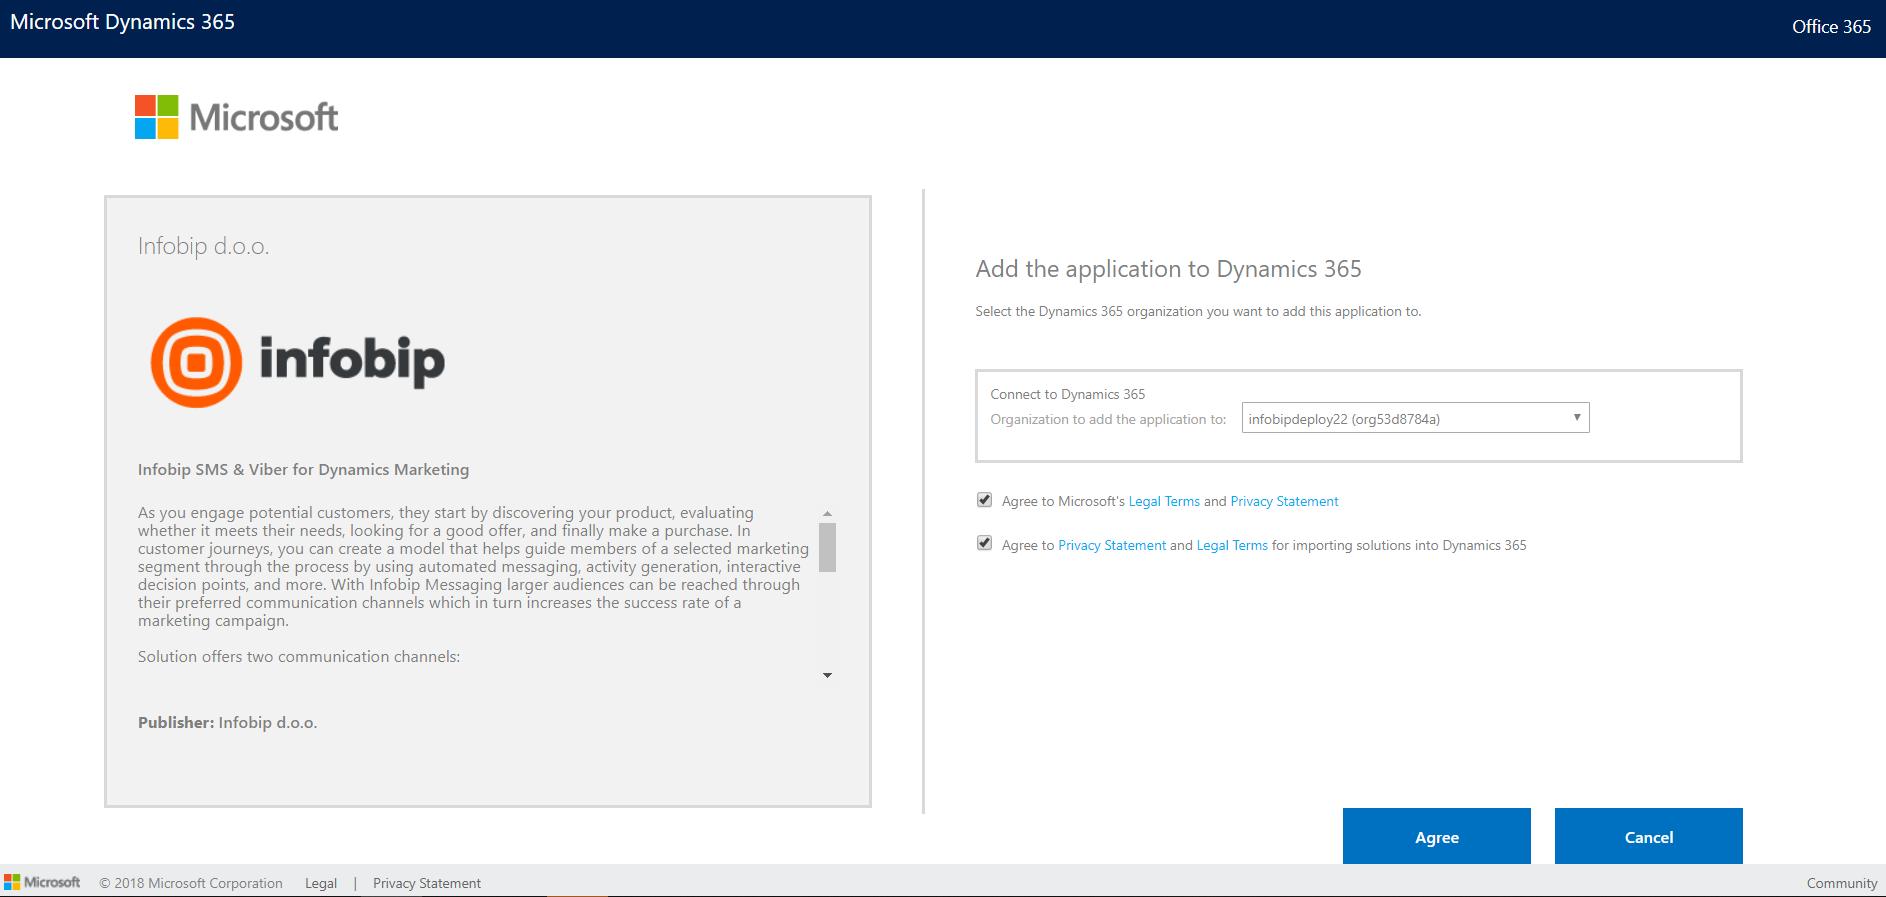 Microsoft Dynamics installation - Infobip